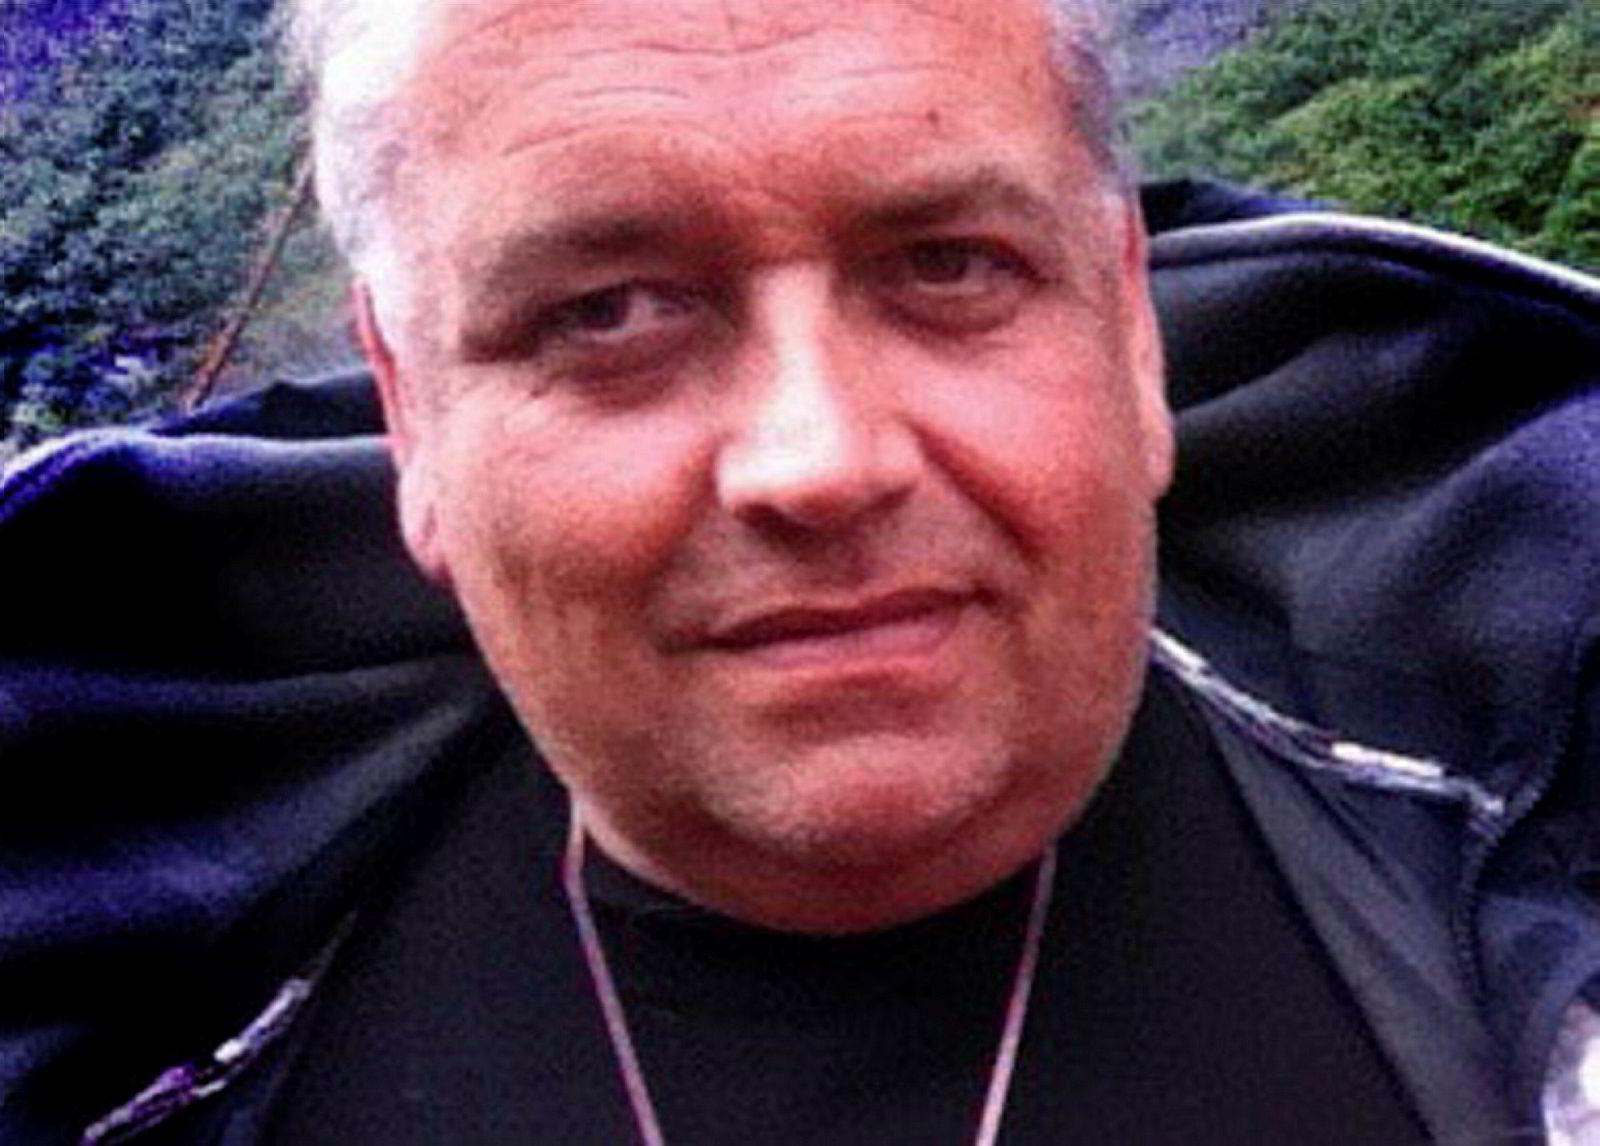 Styreleder i Spar Kjøpas, Iwan Eide Knudsen.